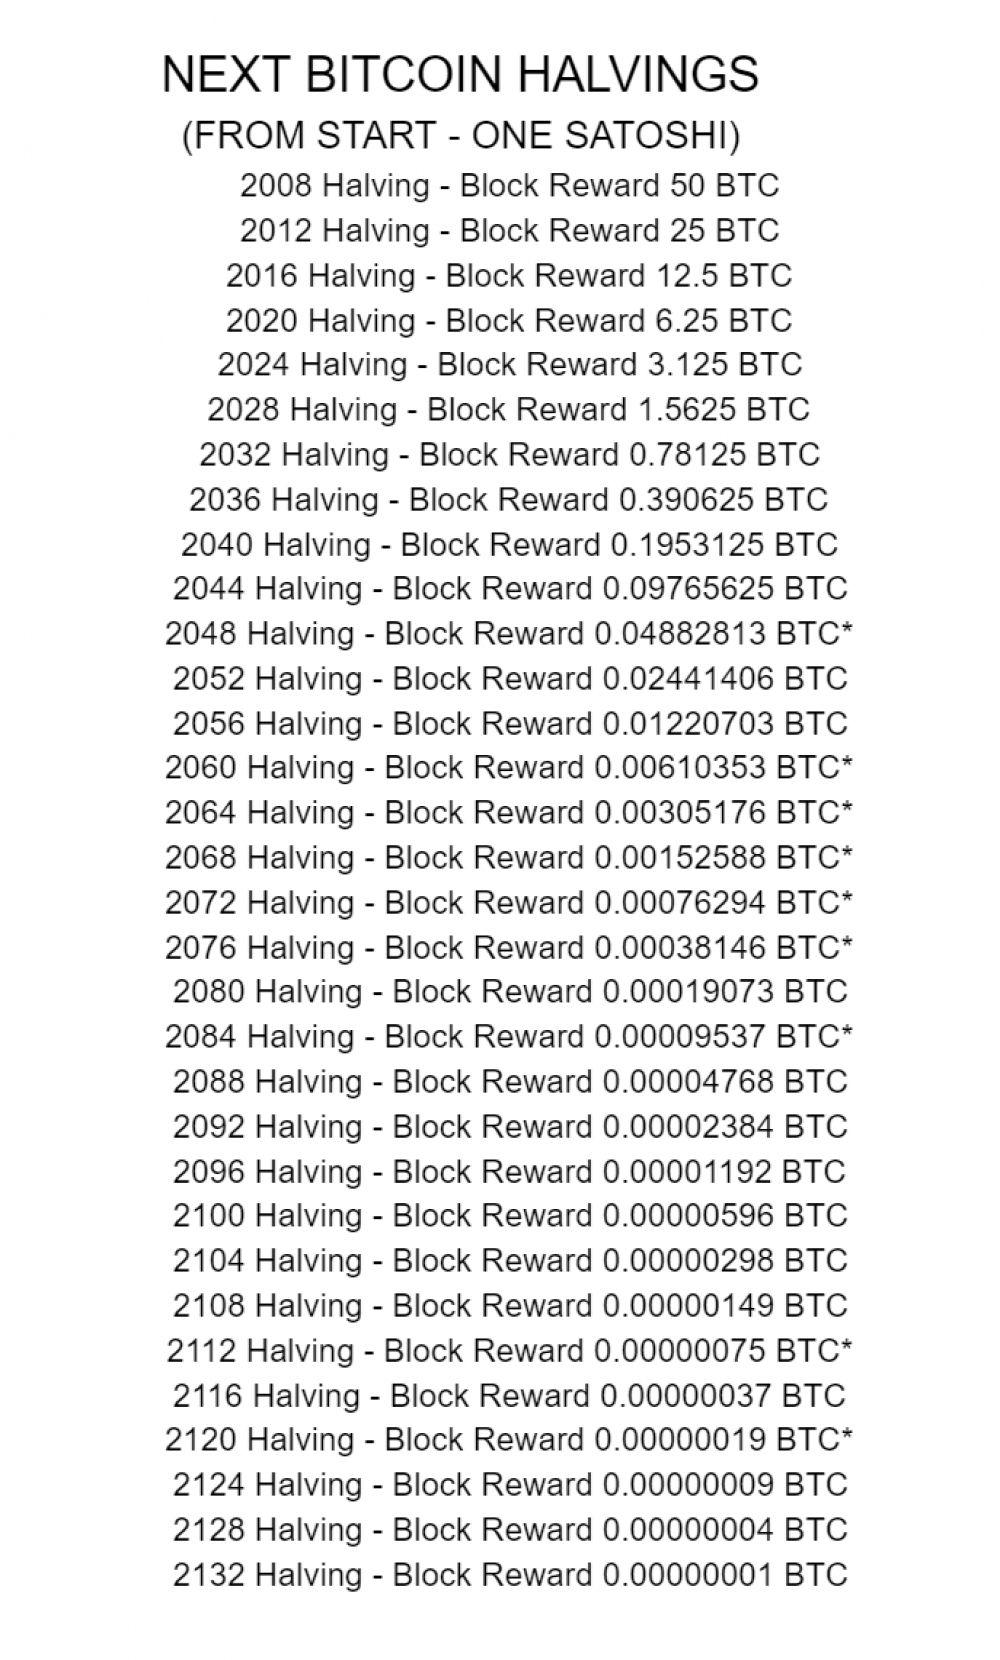 The next bitcoin halvings and block rewards associated